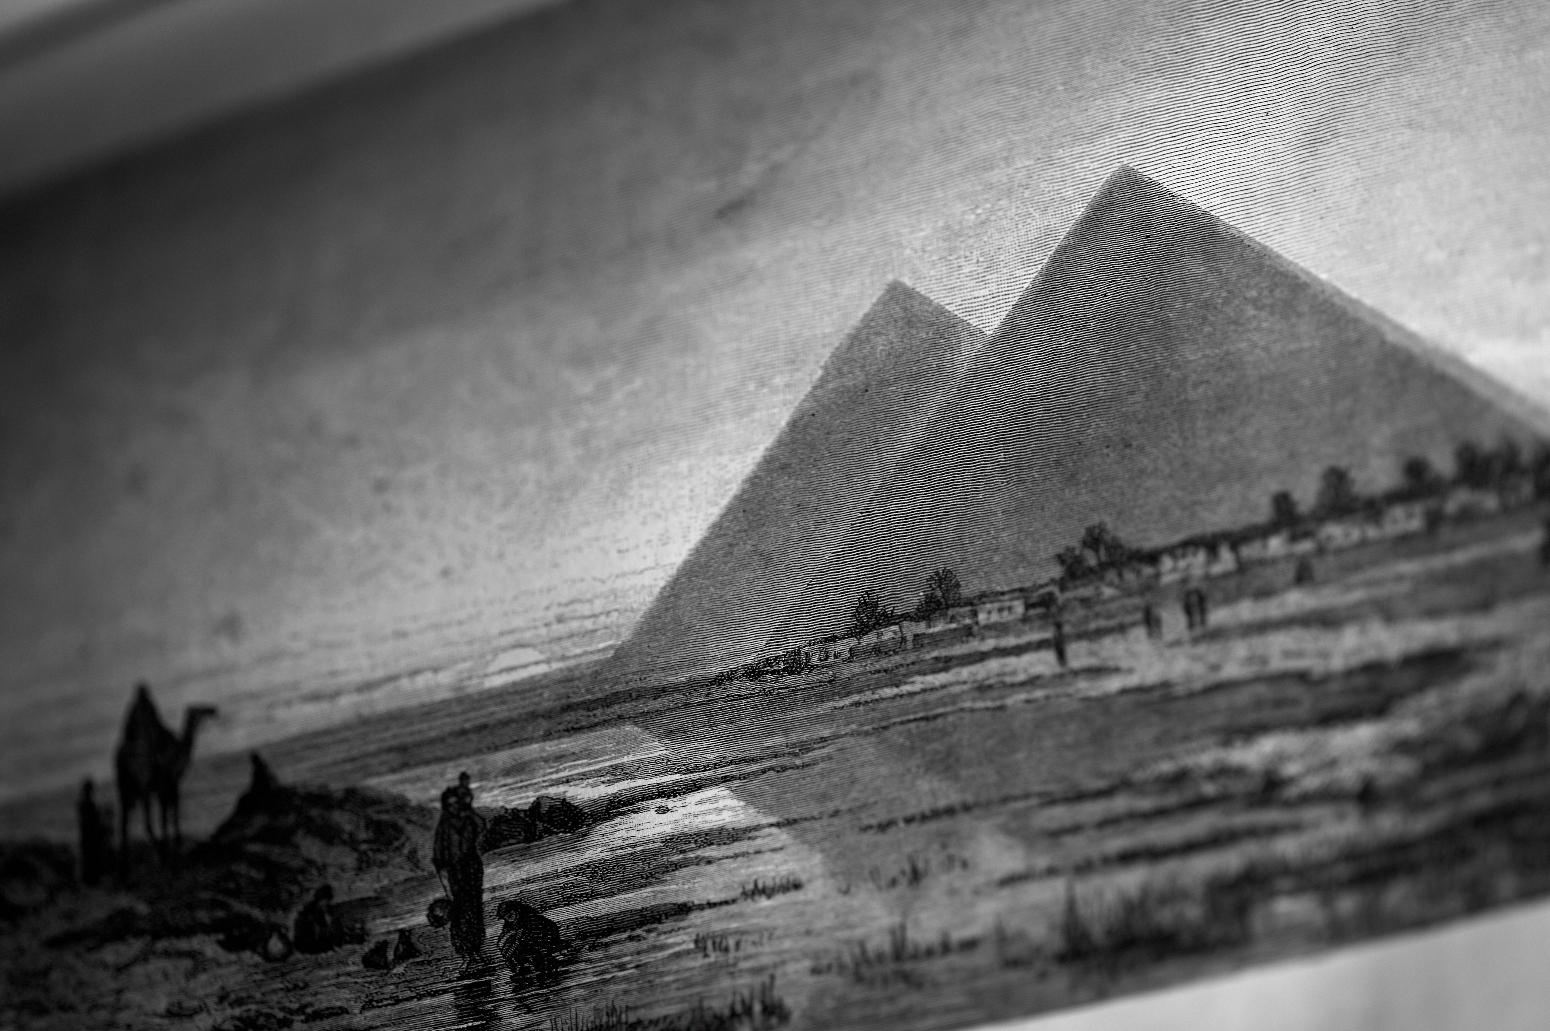 01_Lotus_and_Pyramid_DSC5433.jpg